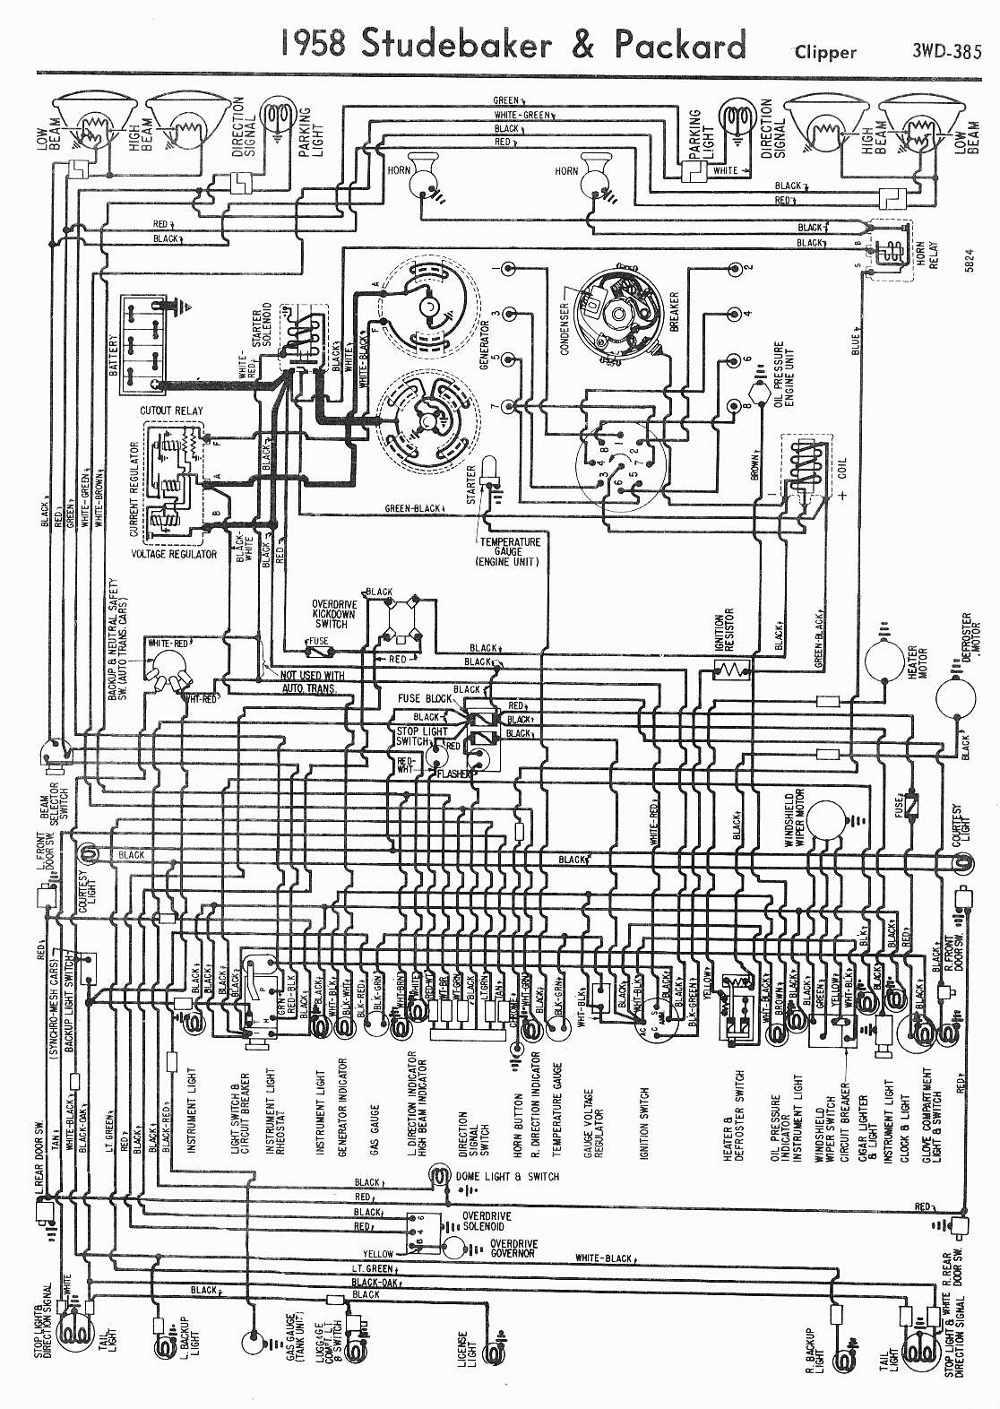 Alternator Install topic13270 moreover 1954 Kaiser Manhattan Wiring Diagram furthermore Fuse Block Install topic35629 furthermore 1938 Buick Roadmaster Phaeton moreover 4 Position Ignition Switch Wiring Diagram. on 1946 willys jeep wiring